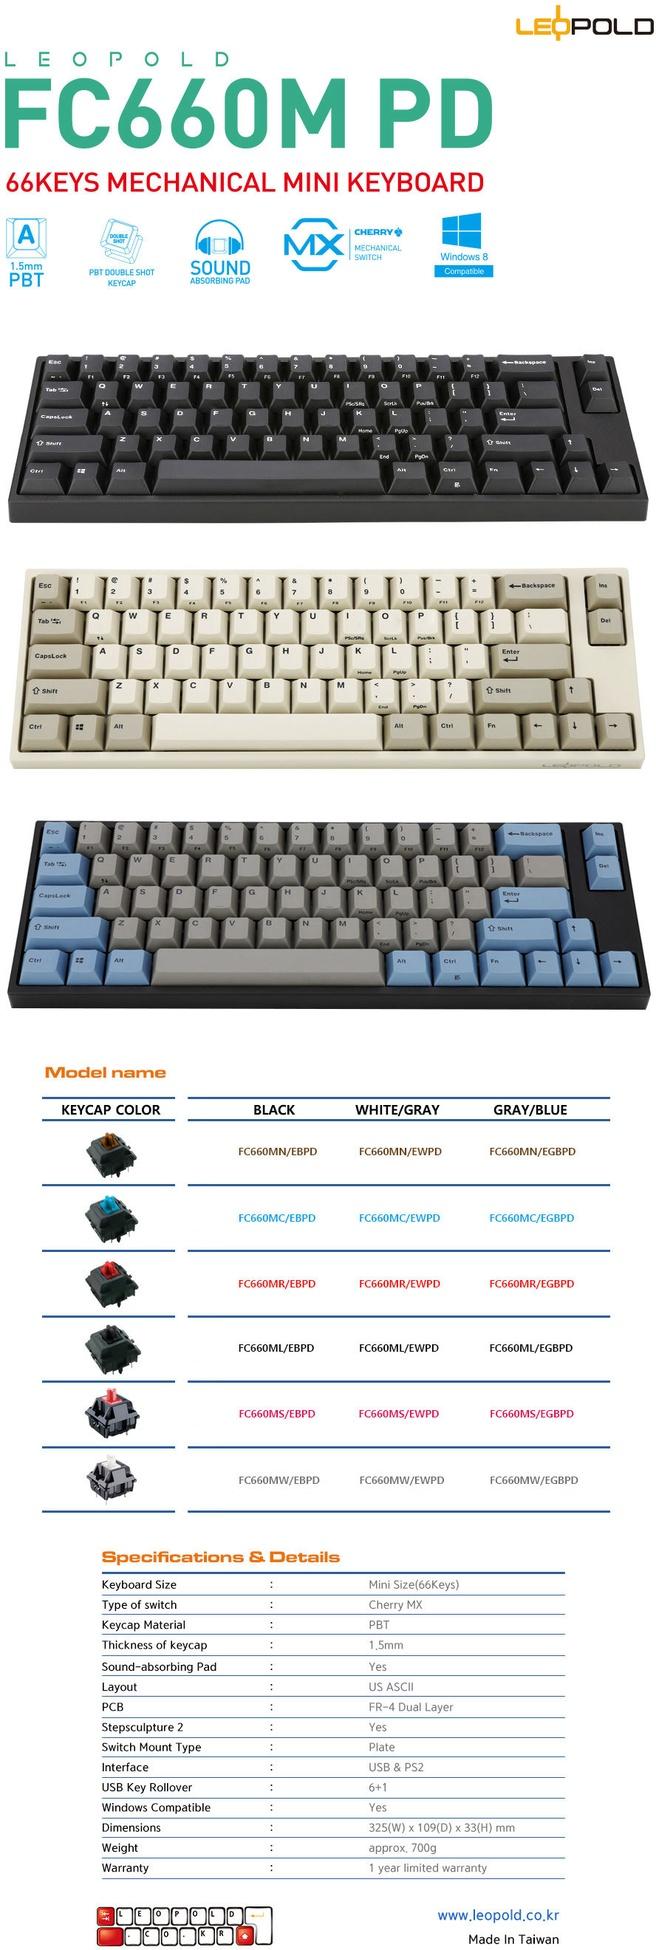 Leopold FC660M PD TKL white PBT Keycaps MX RedUS